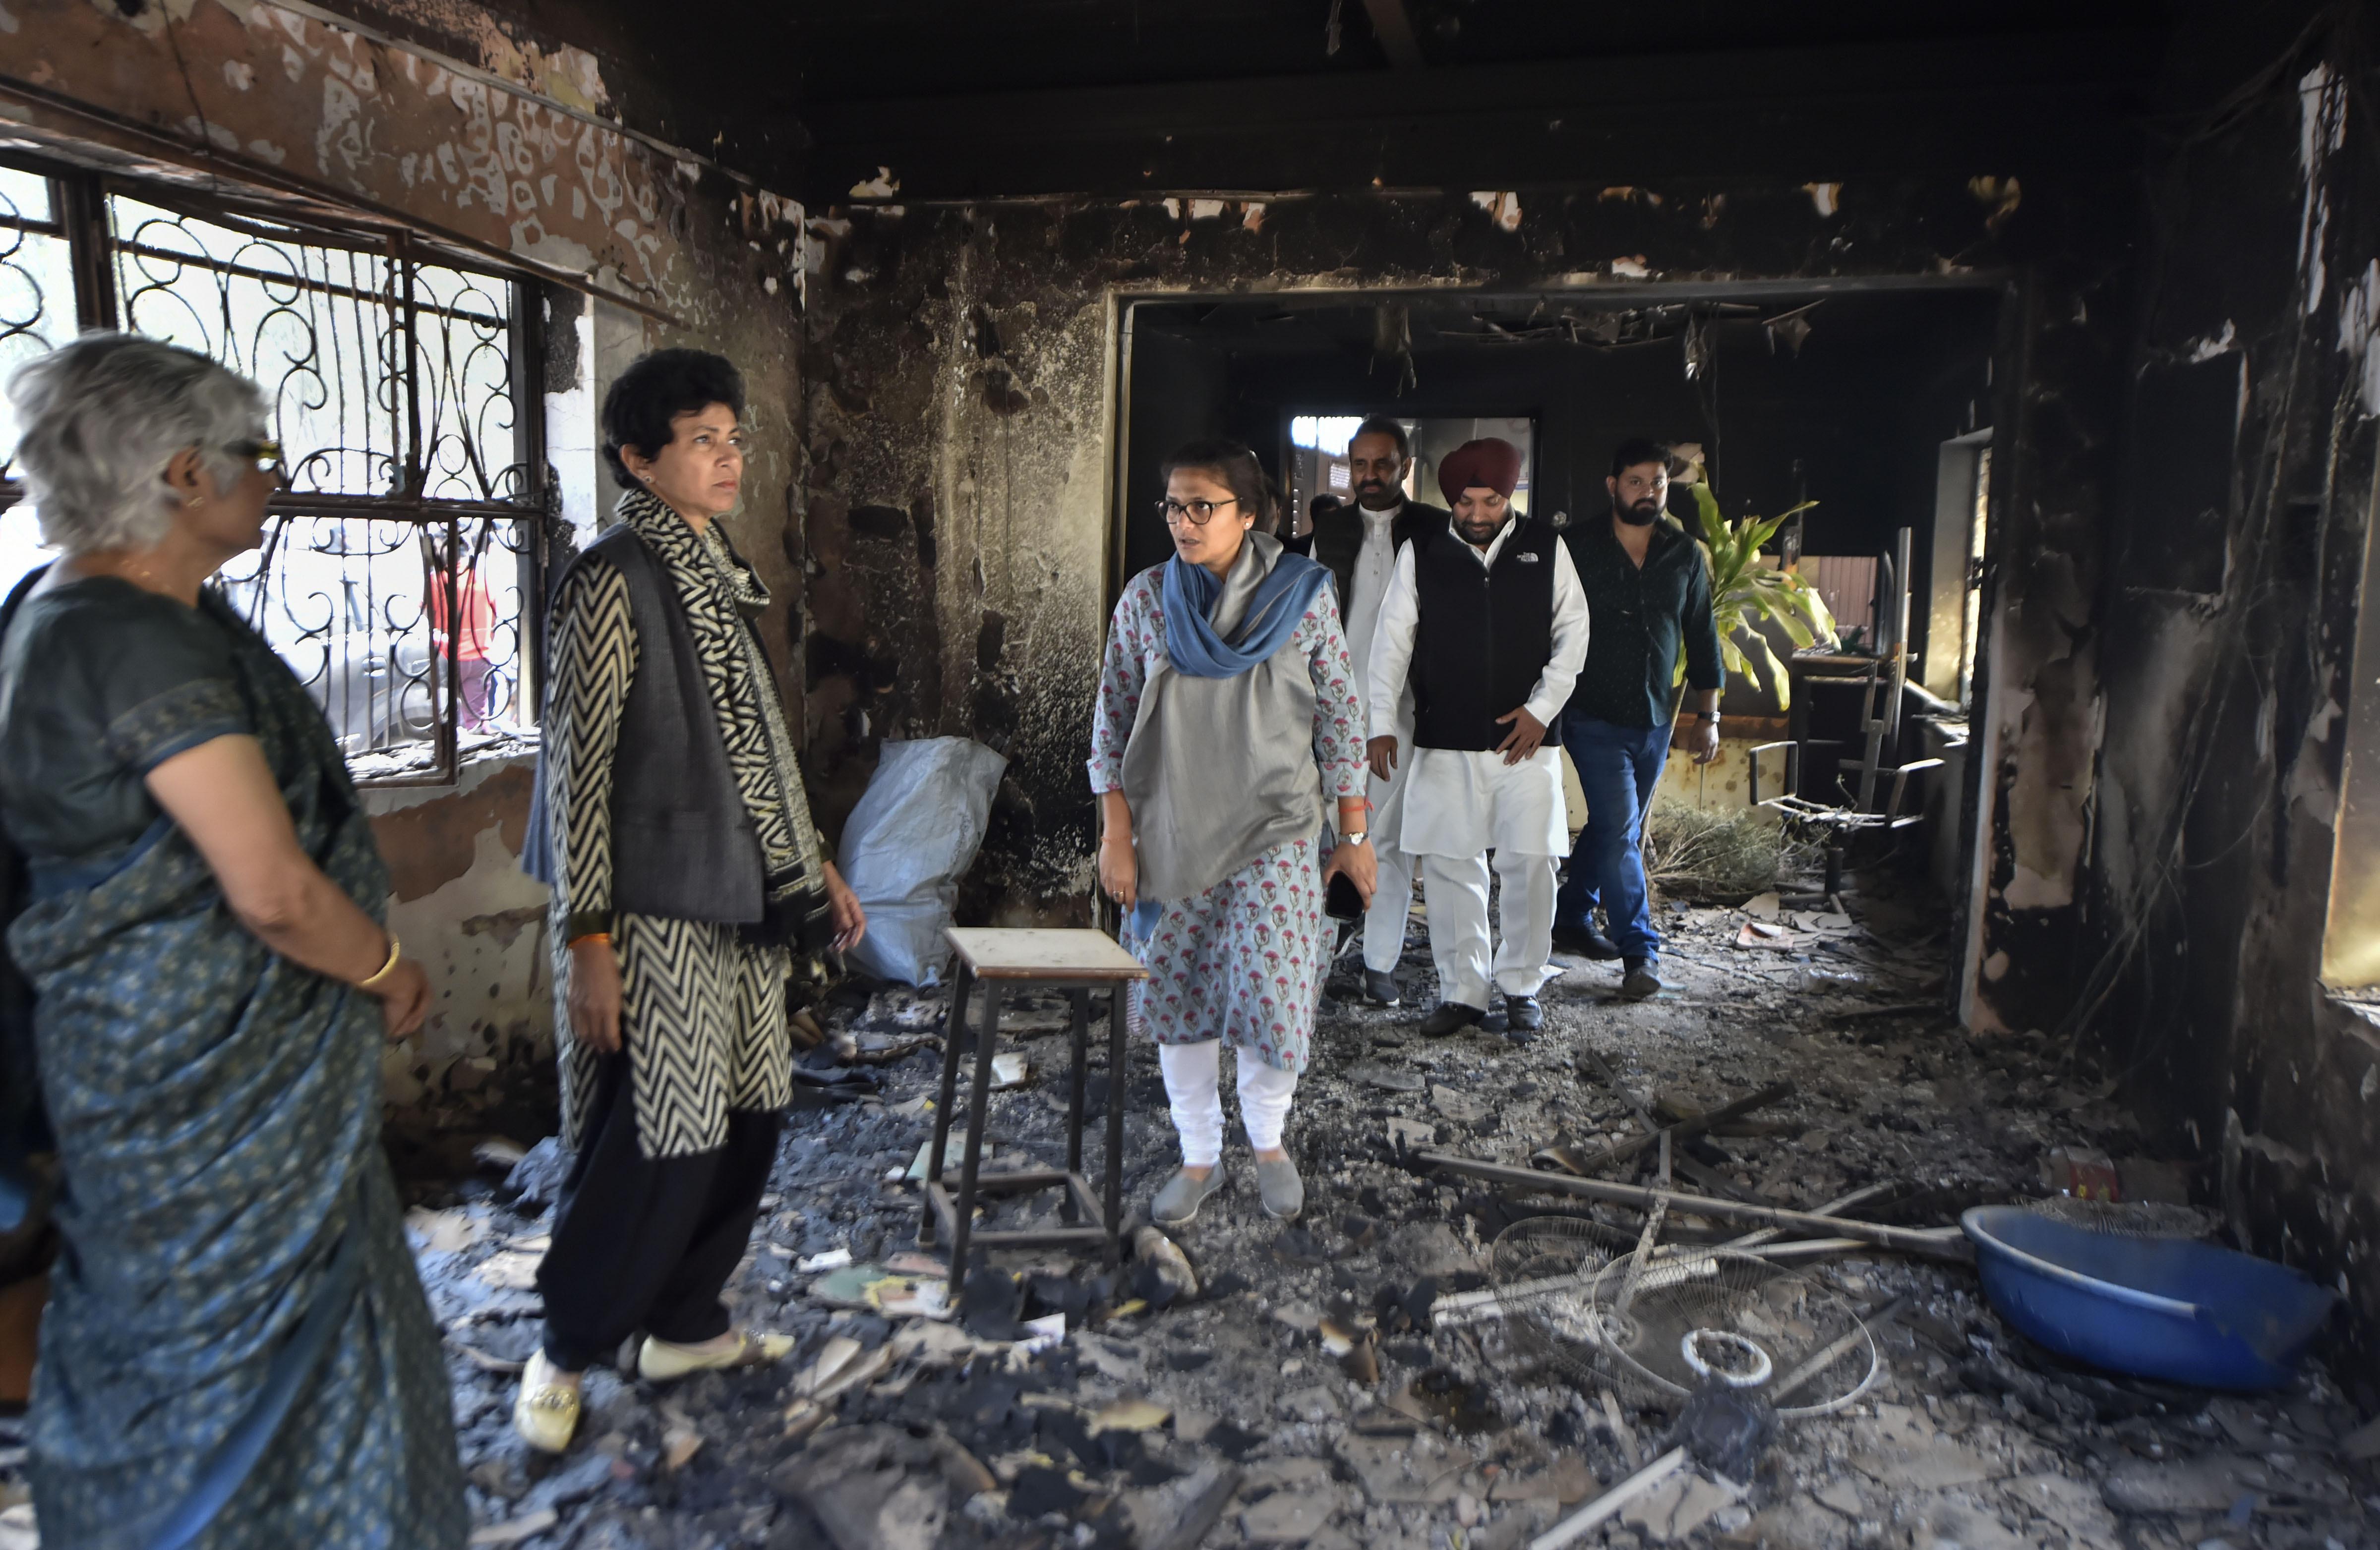 Congress delegation comprising Kumari Selja, Sushmita Dev, Shaktisinh Gohil and Amarinder Singh visit riot-affected area , at Old Mustafabad area in Northeast Delhi, Saturday, February 29, 2020.